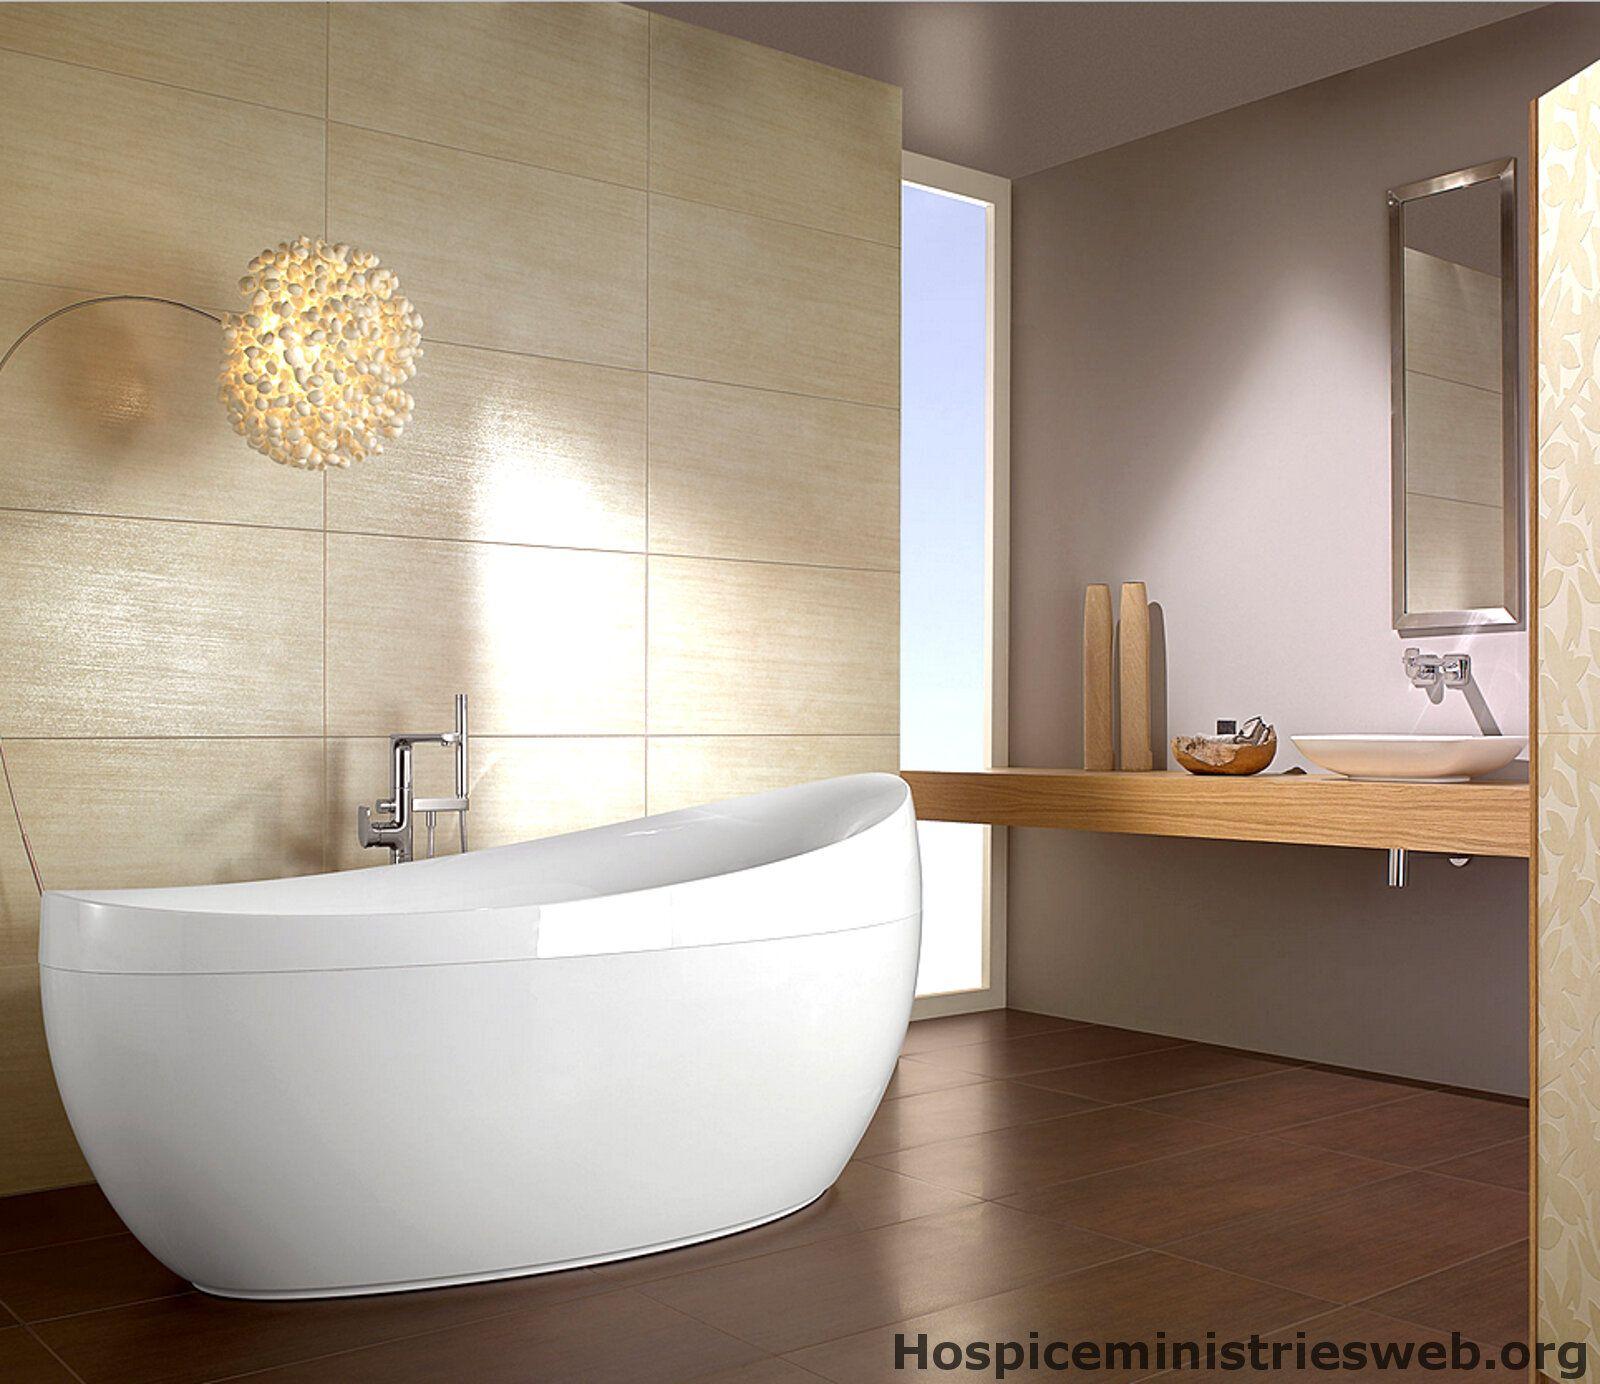 35 Ideen fr Badezimmer Braun Beige Wohn Ideen  Badezimmer  Bathroom design small Bathroom